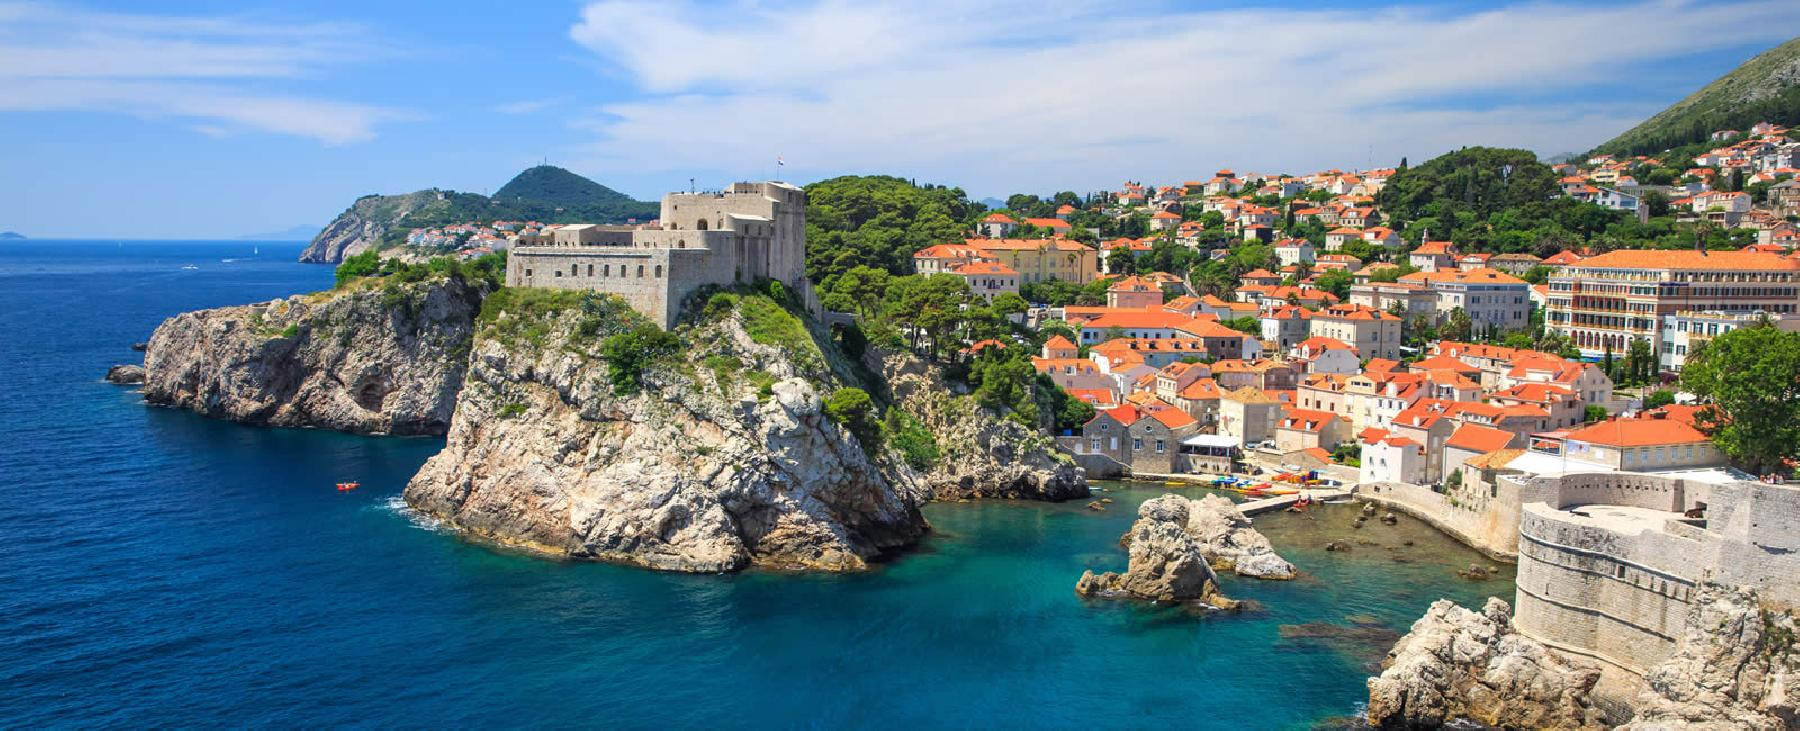 Health tourism Croatia